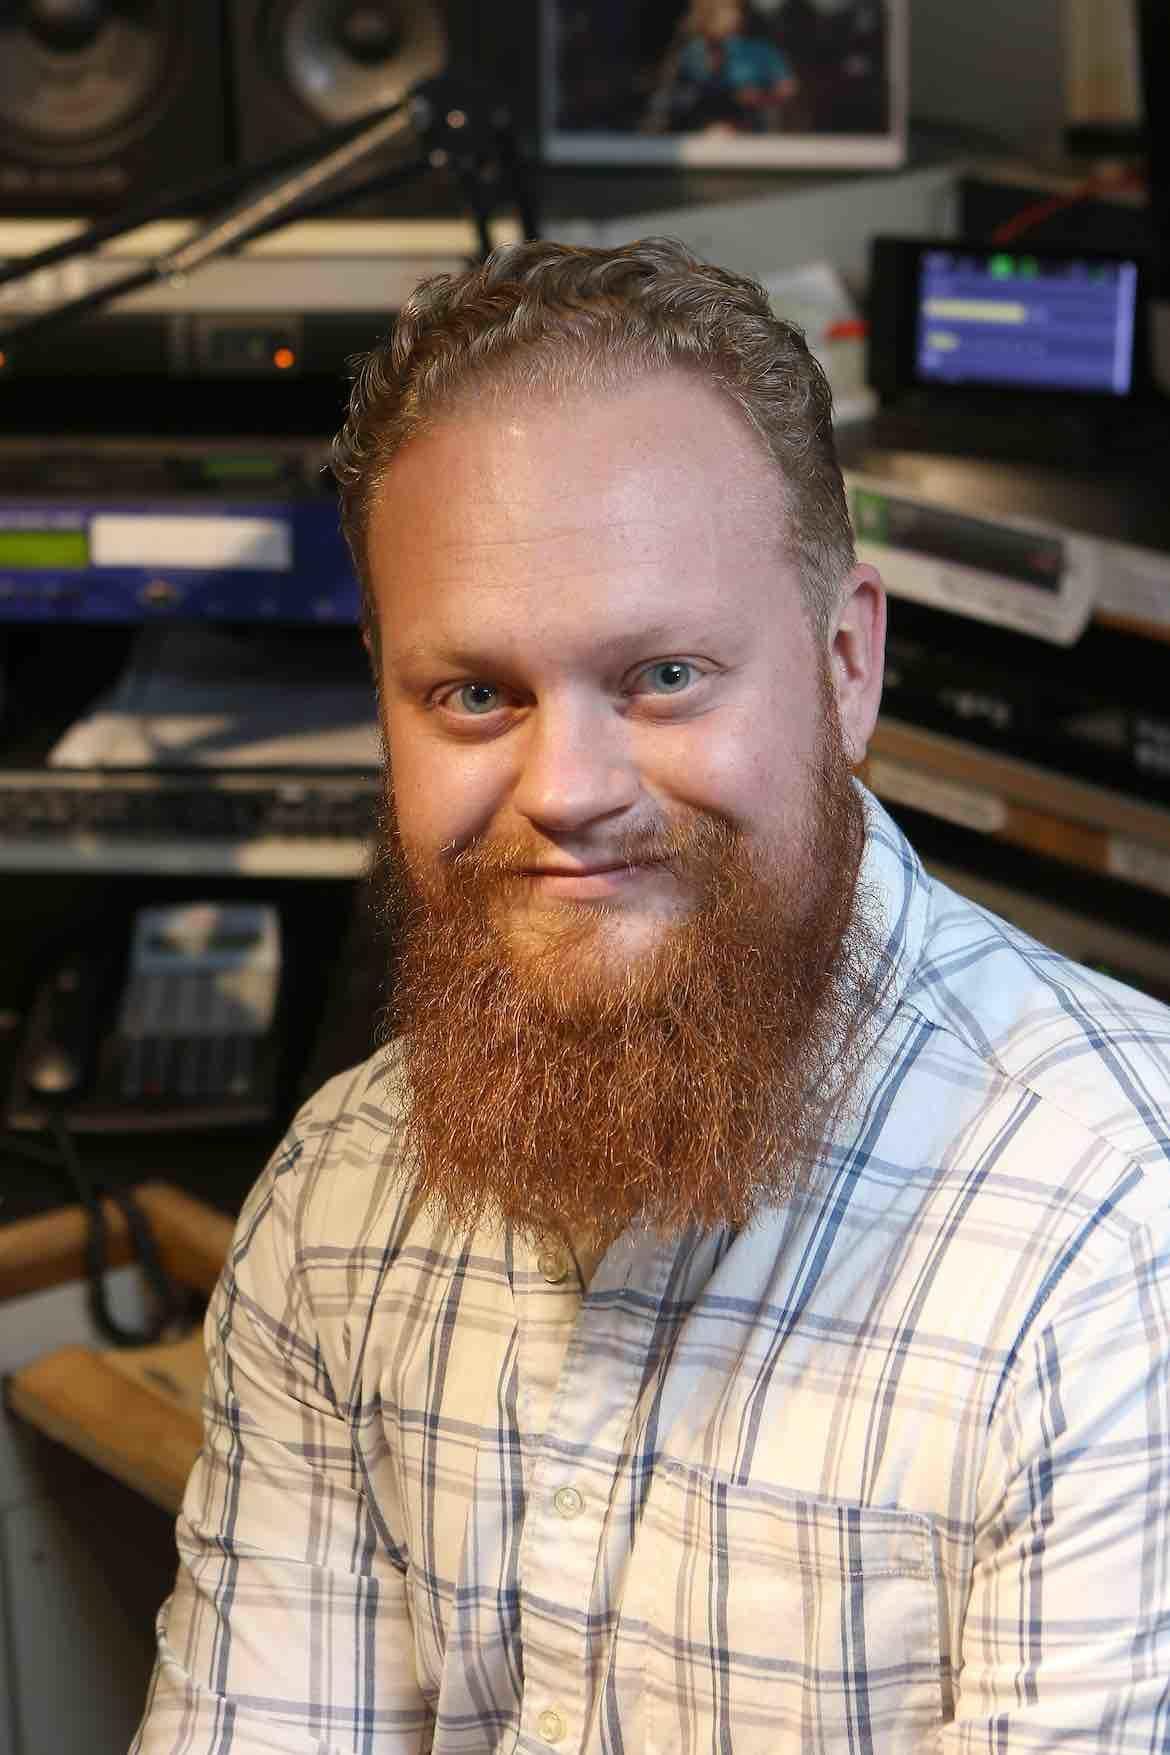 KRCC GM resigns following deal with Colorado Public Radio